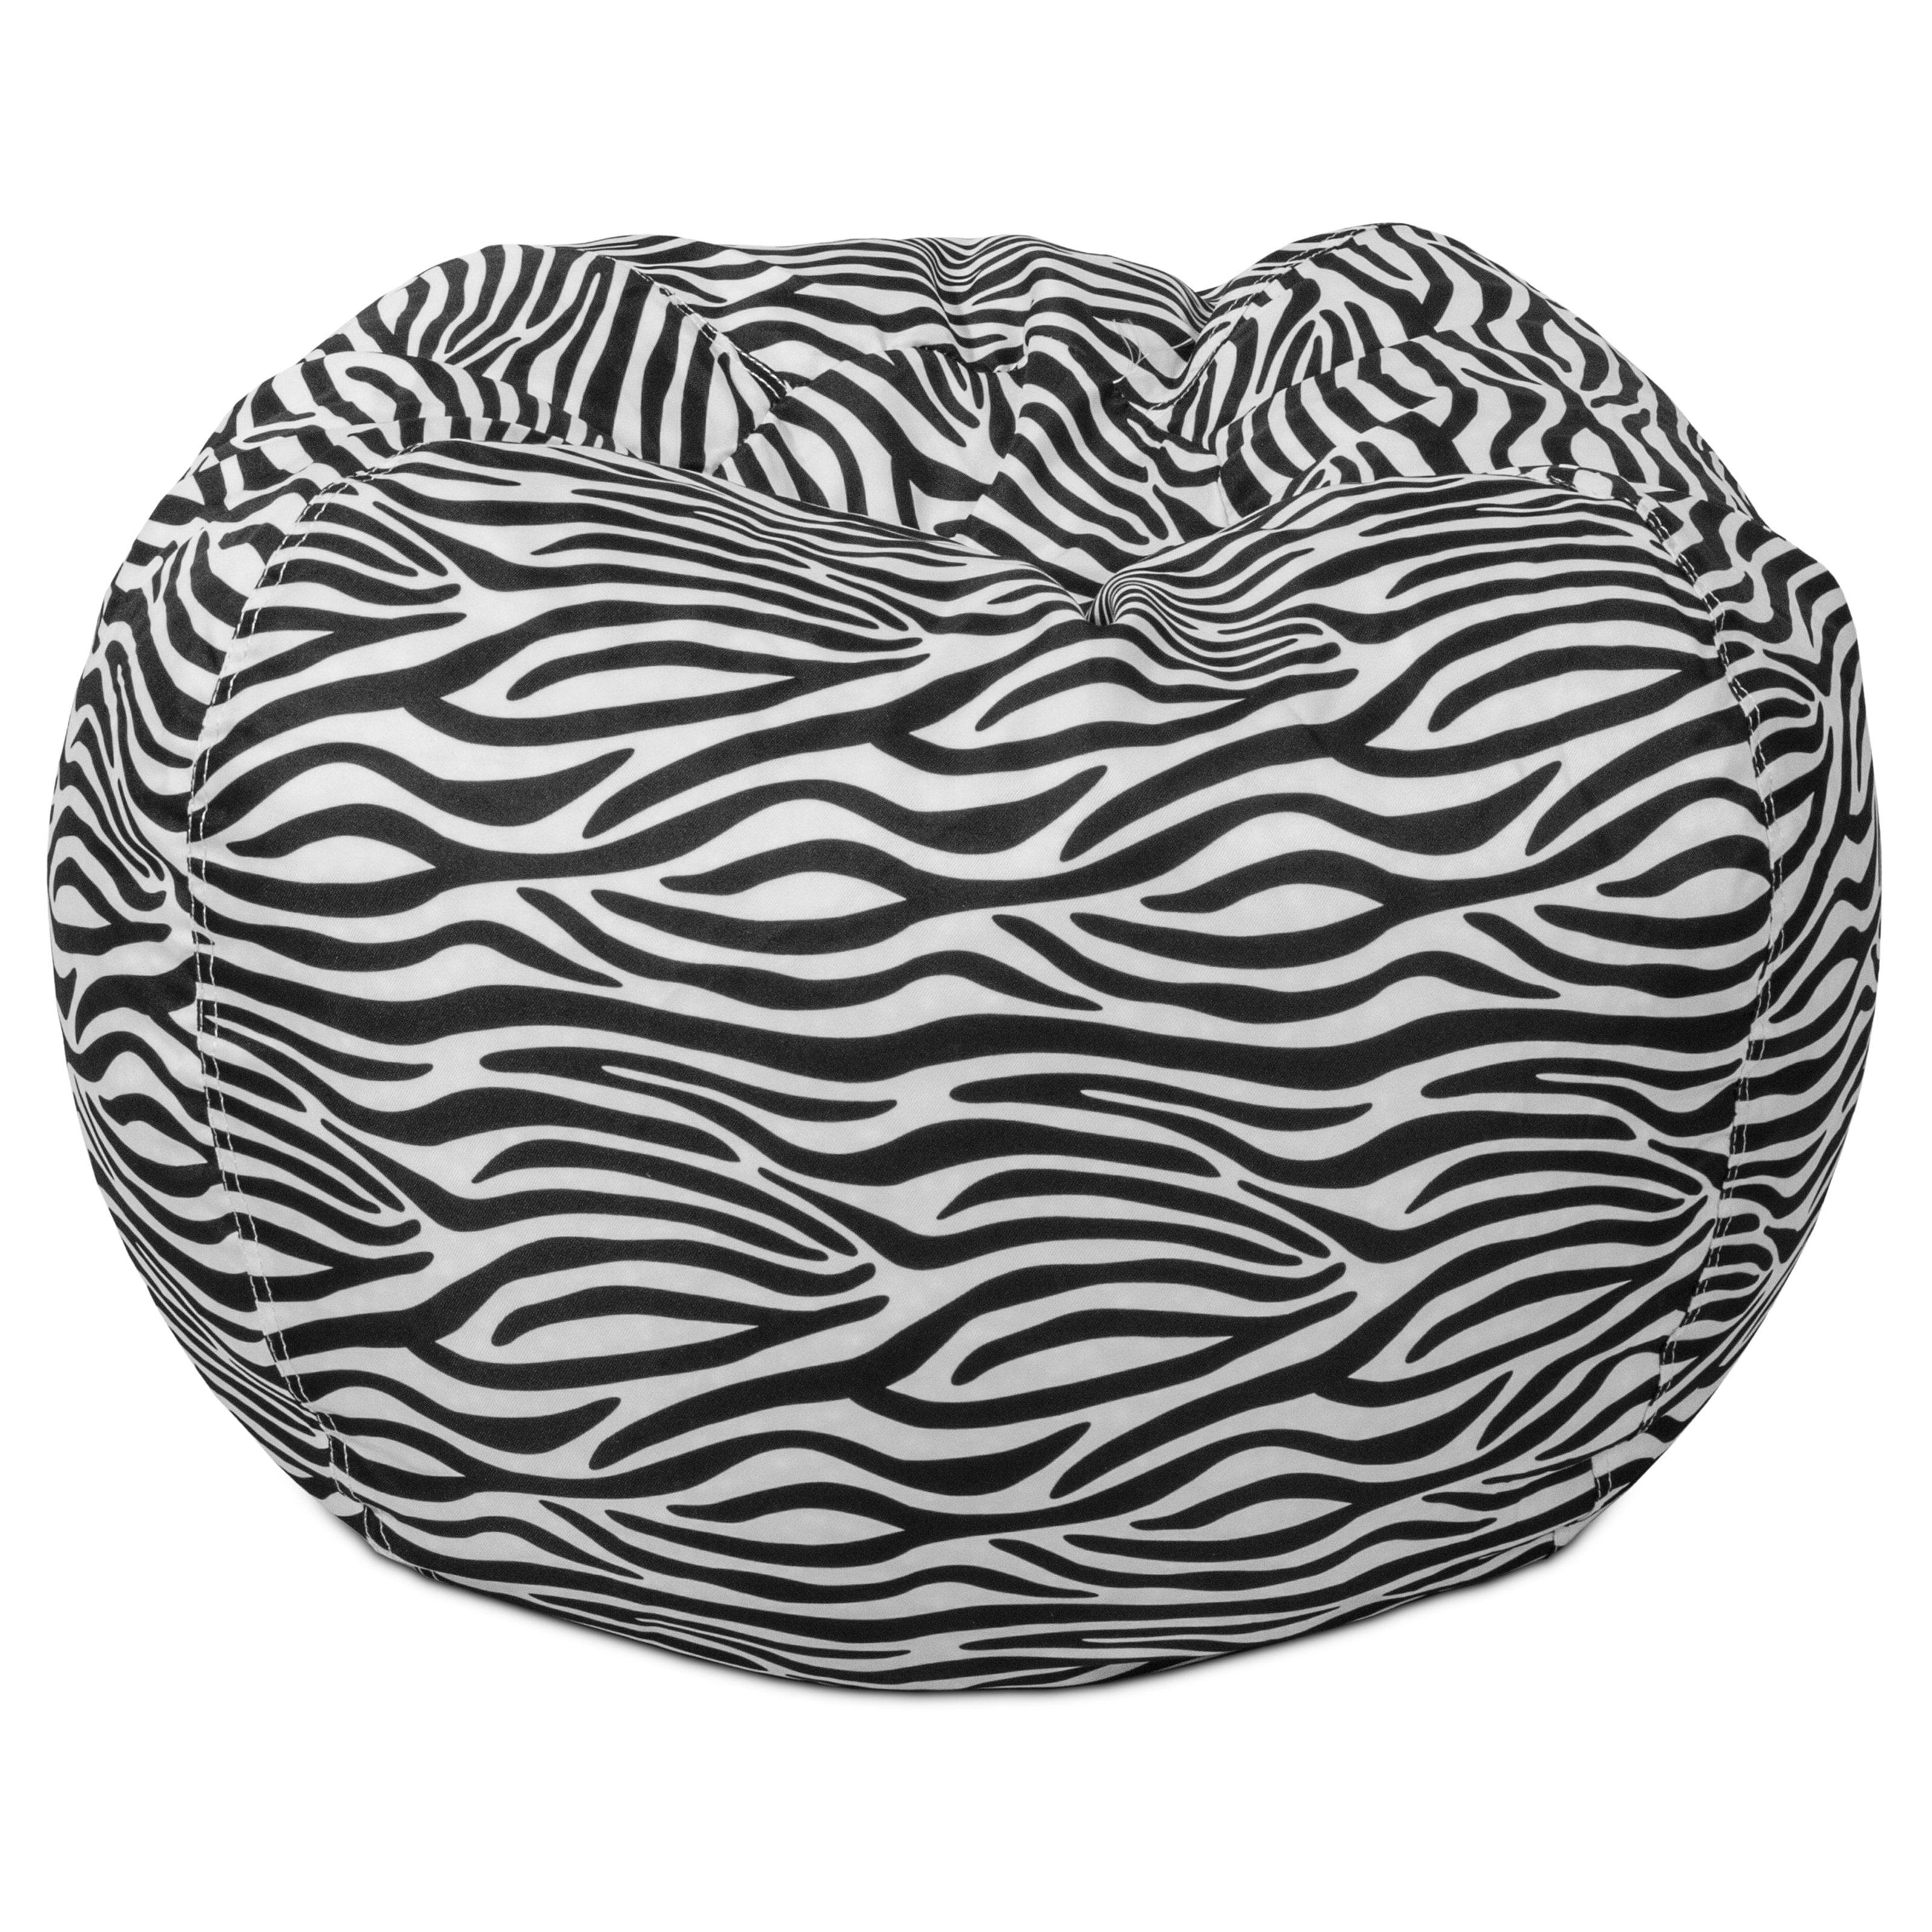 The Classic Ultimax Bean Bag Lounger - Zebra